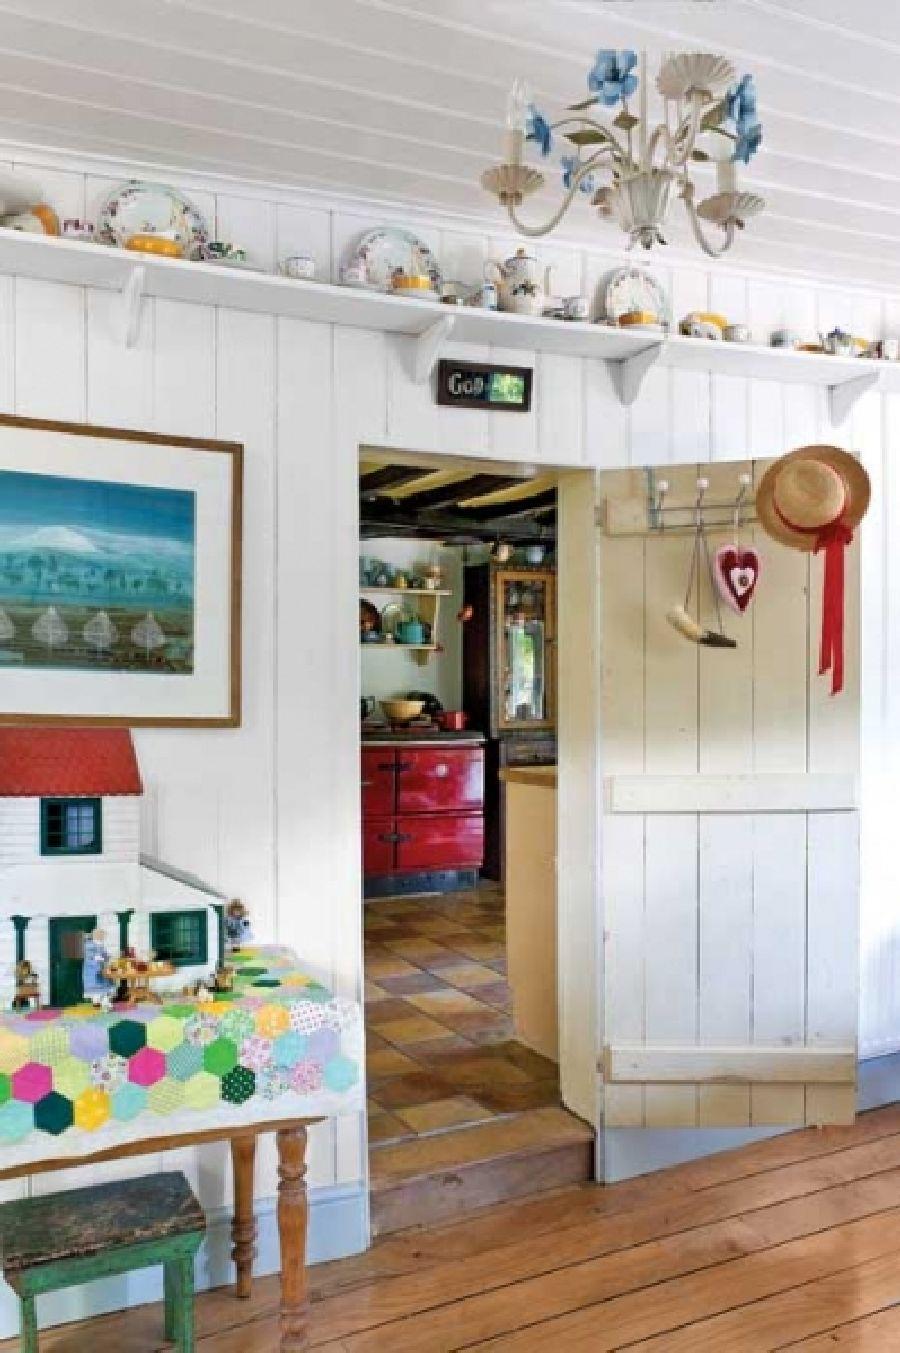 adelaparvu.com despre casa rustica in Anglia, The Rosy Tea Company cottage (4)